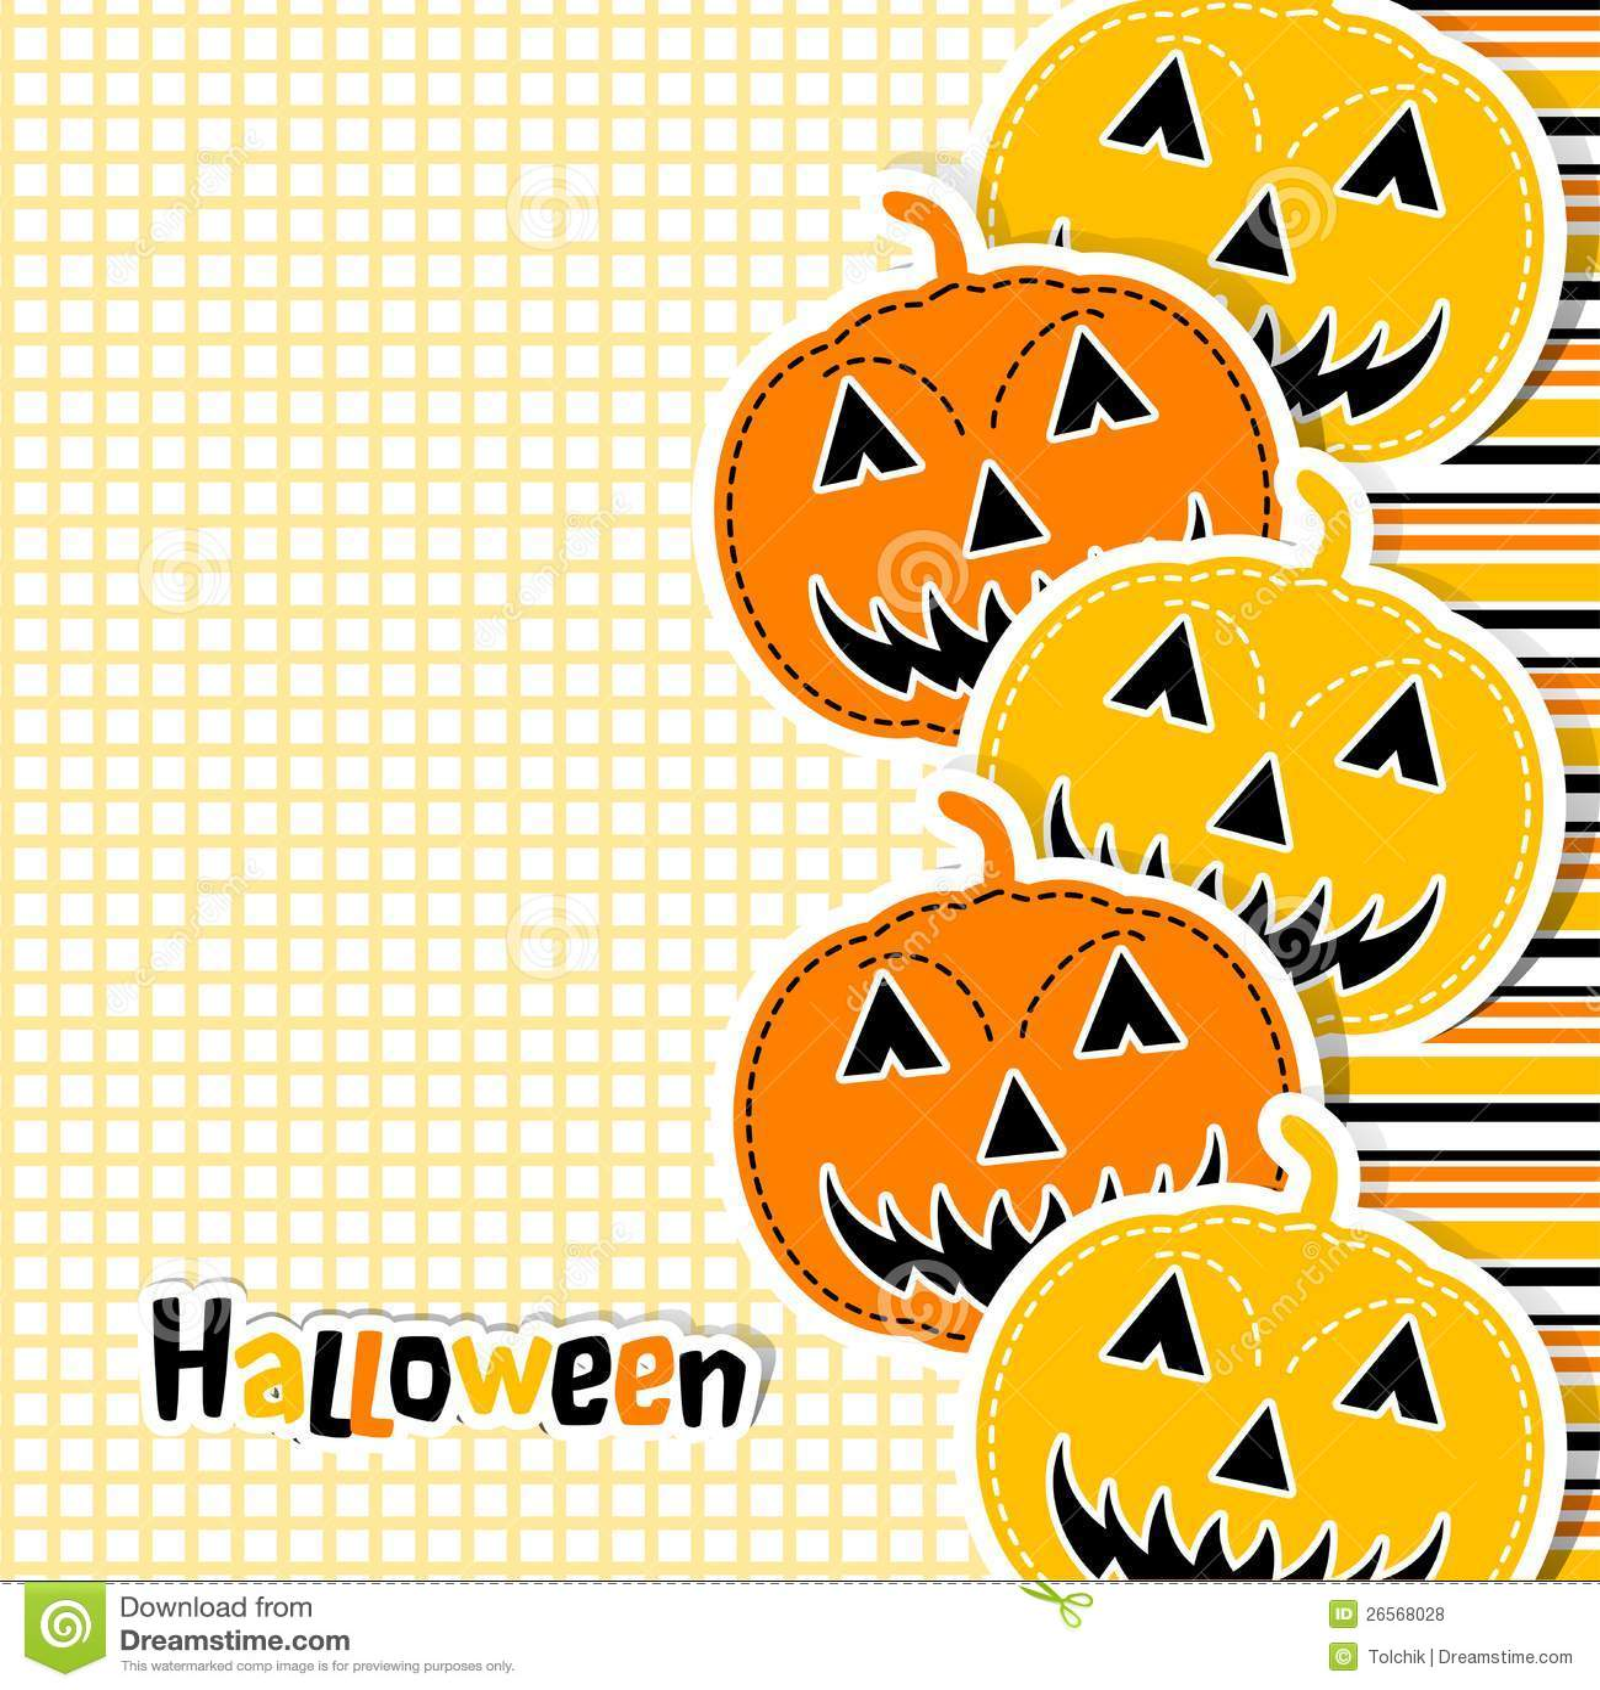 Antique halloween cards